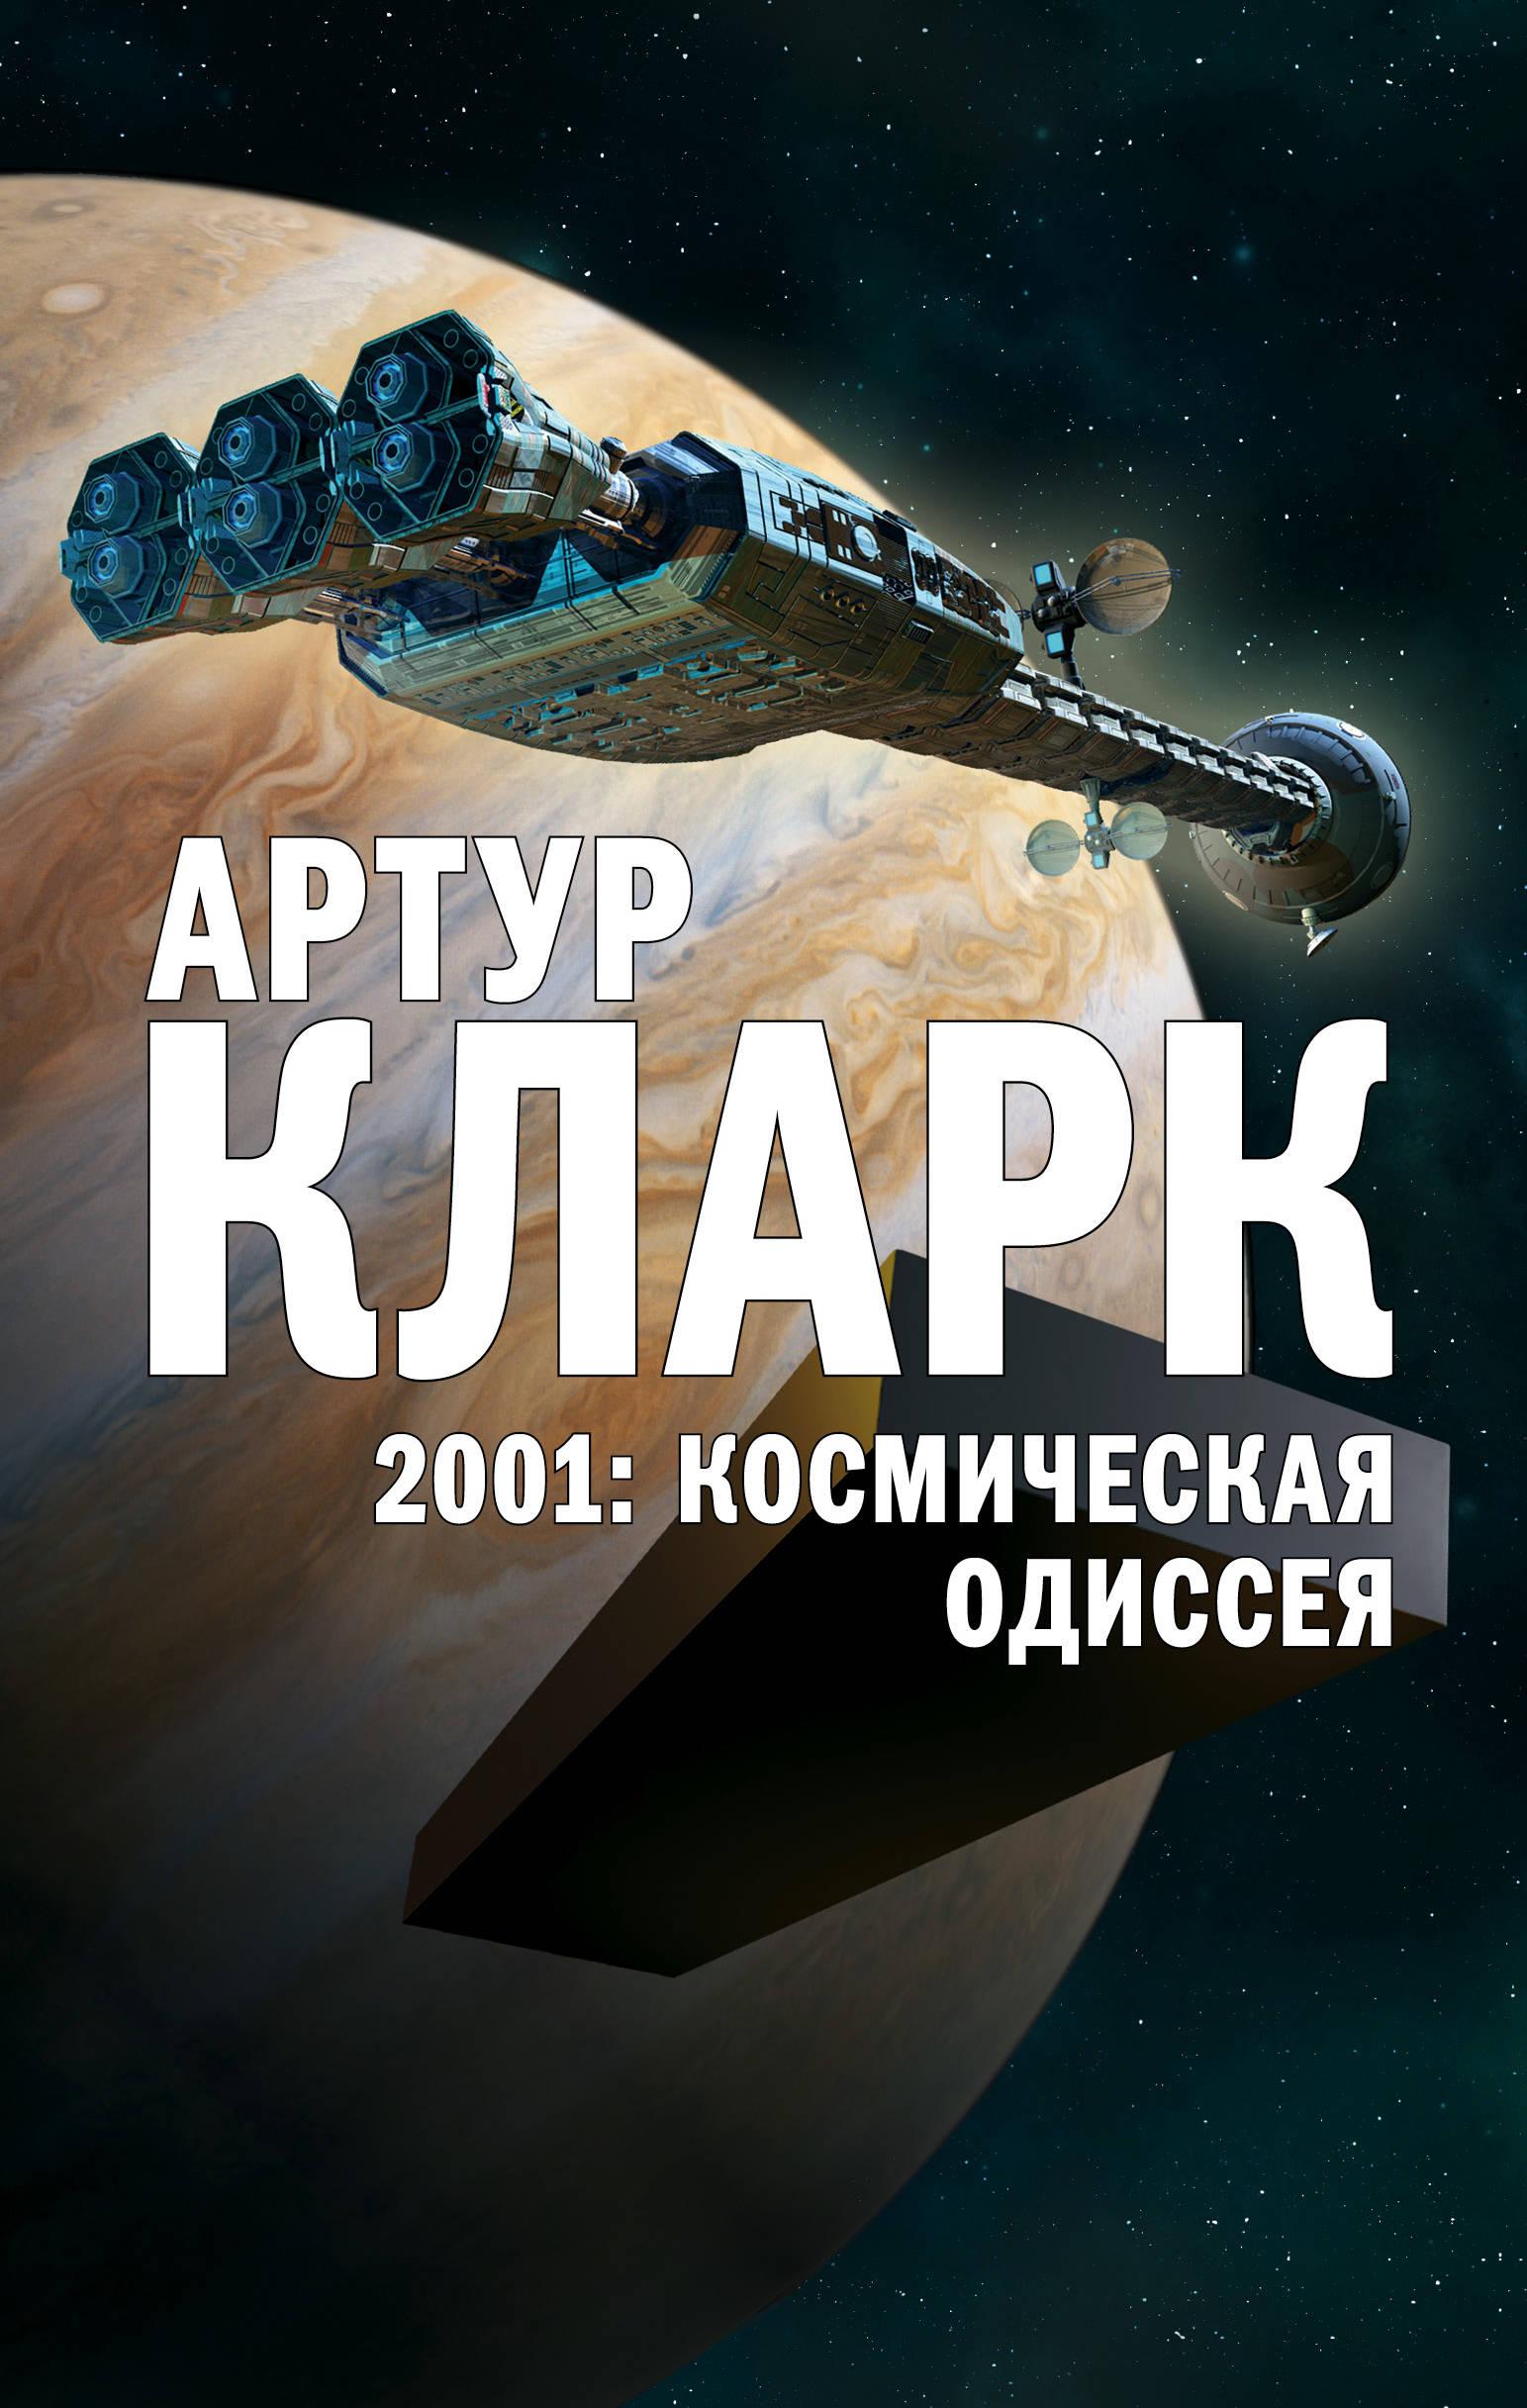 Кларк Артур 2001: Космическая Одиссея кларк артур чарлз 2001 космическая одиссея